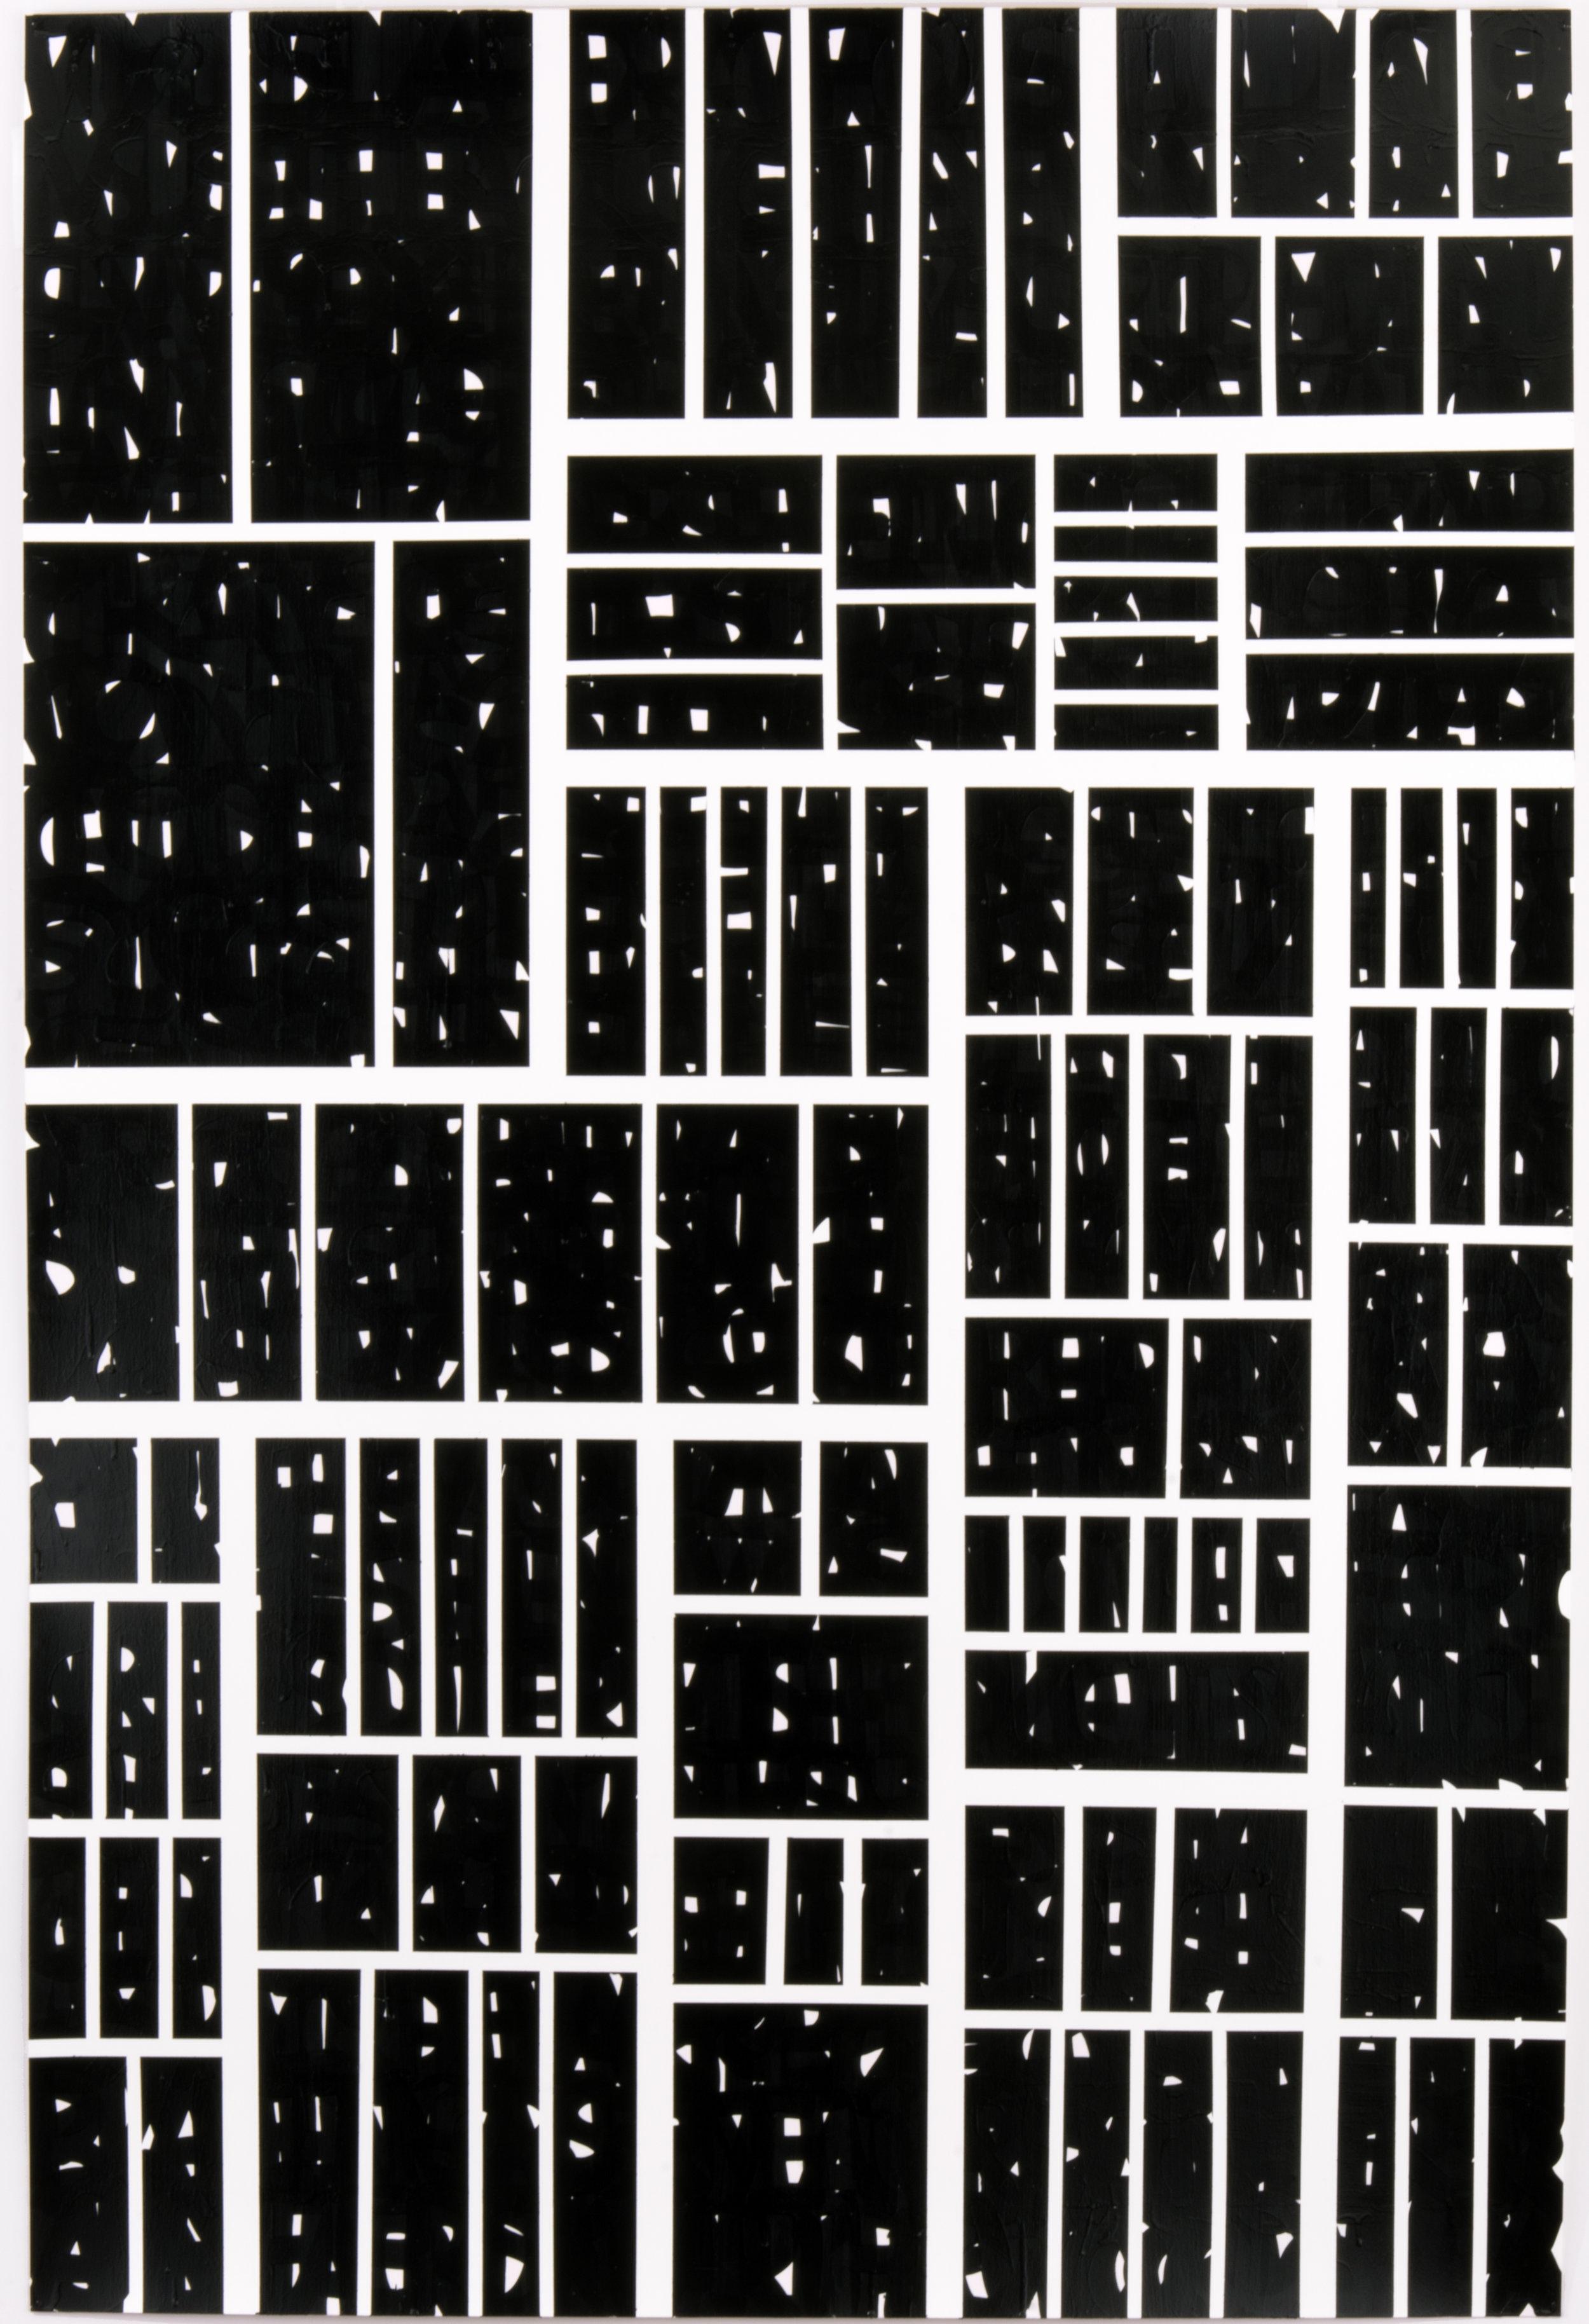 "Strange Hell of Beauty - Black, 42"" x 60"", acrylic and enamel on paper, 2016."